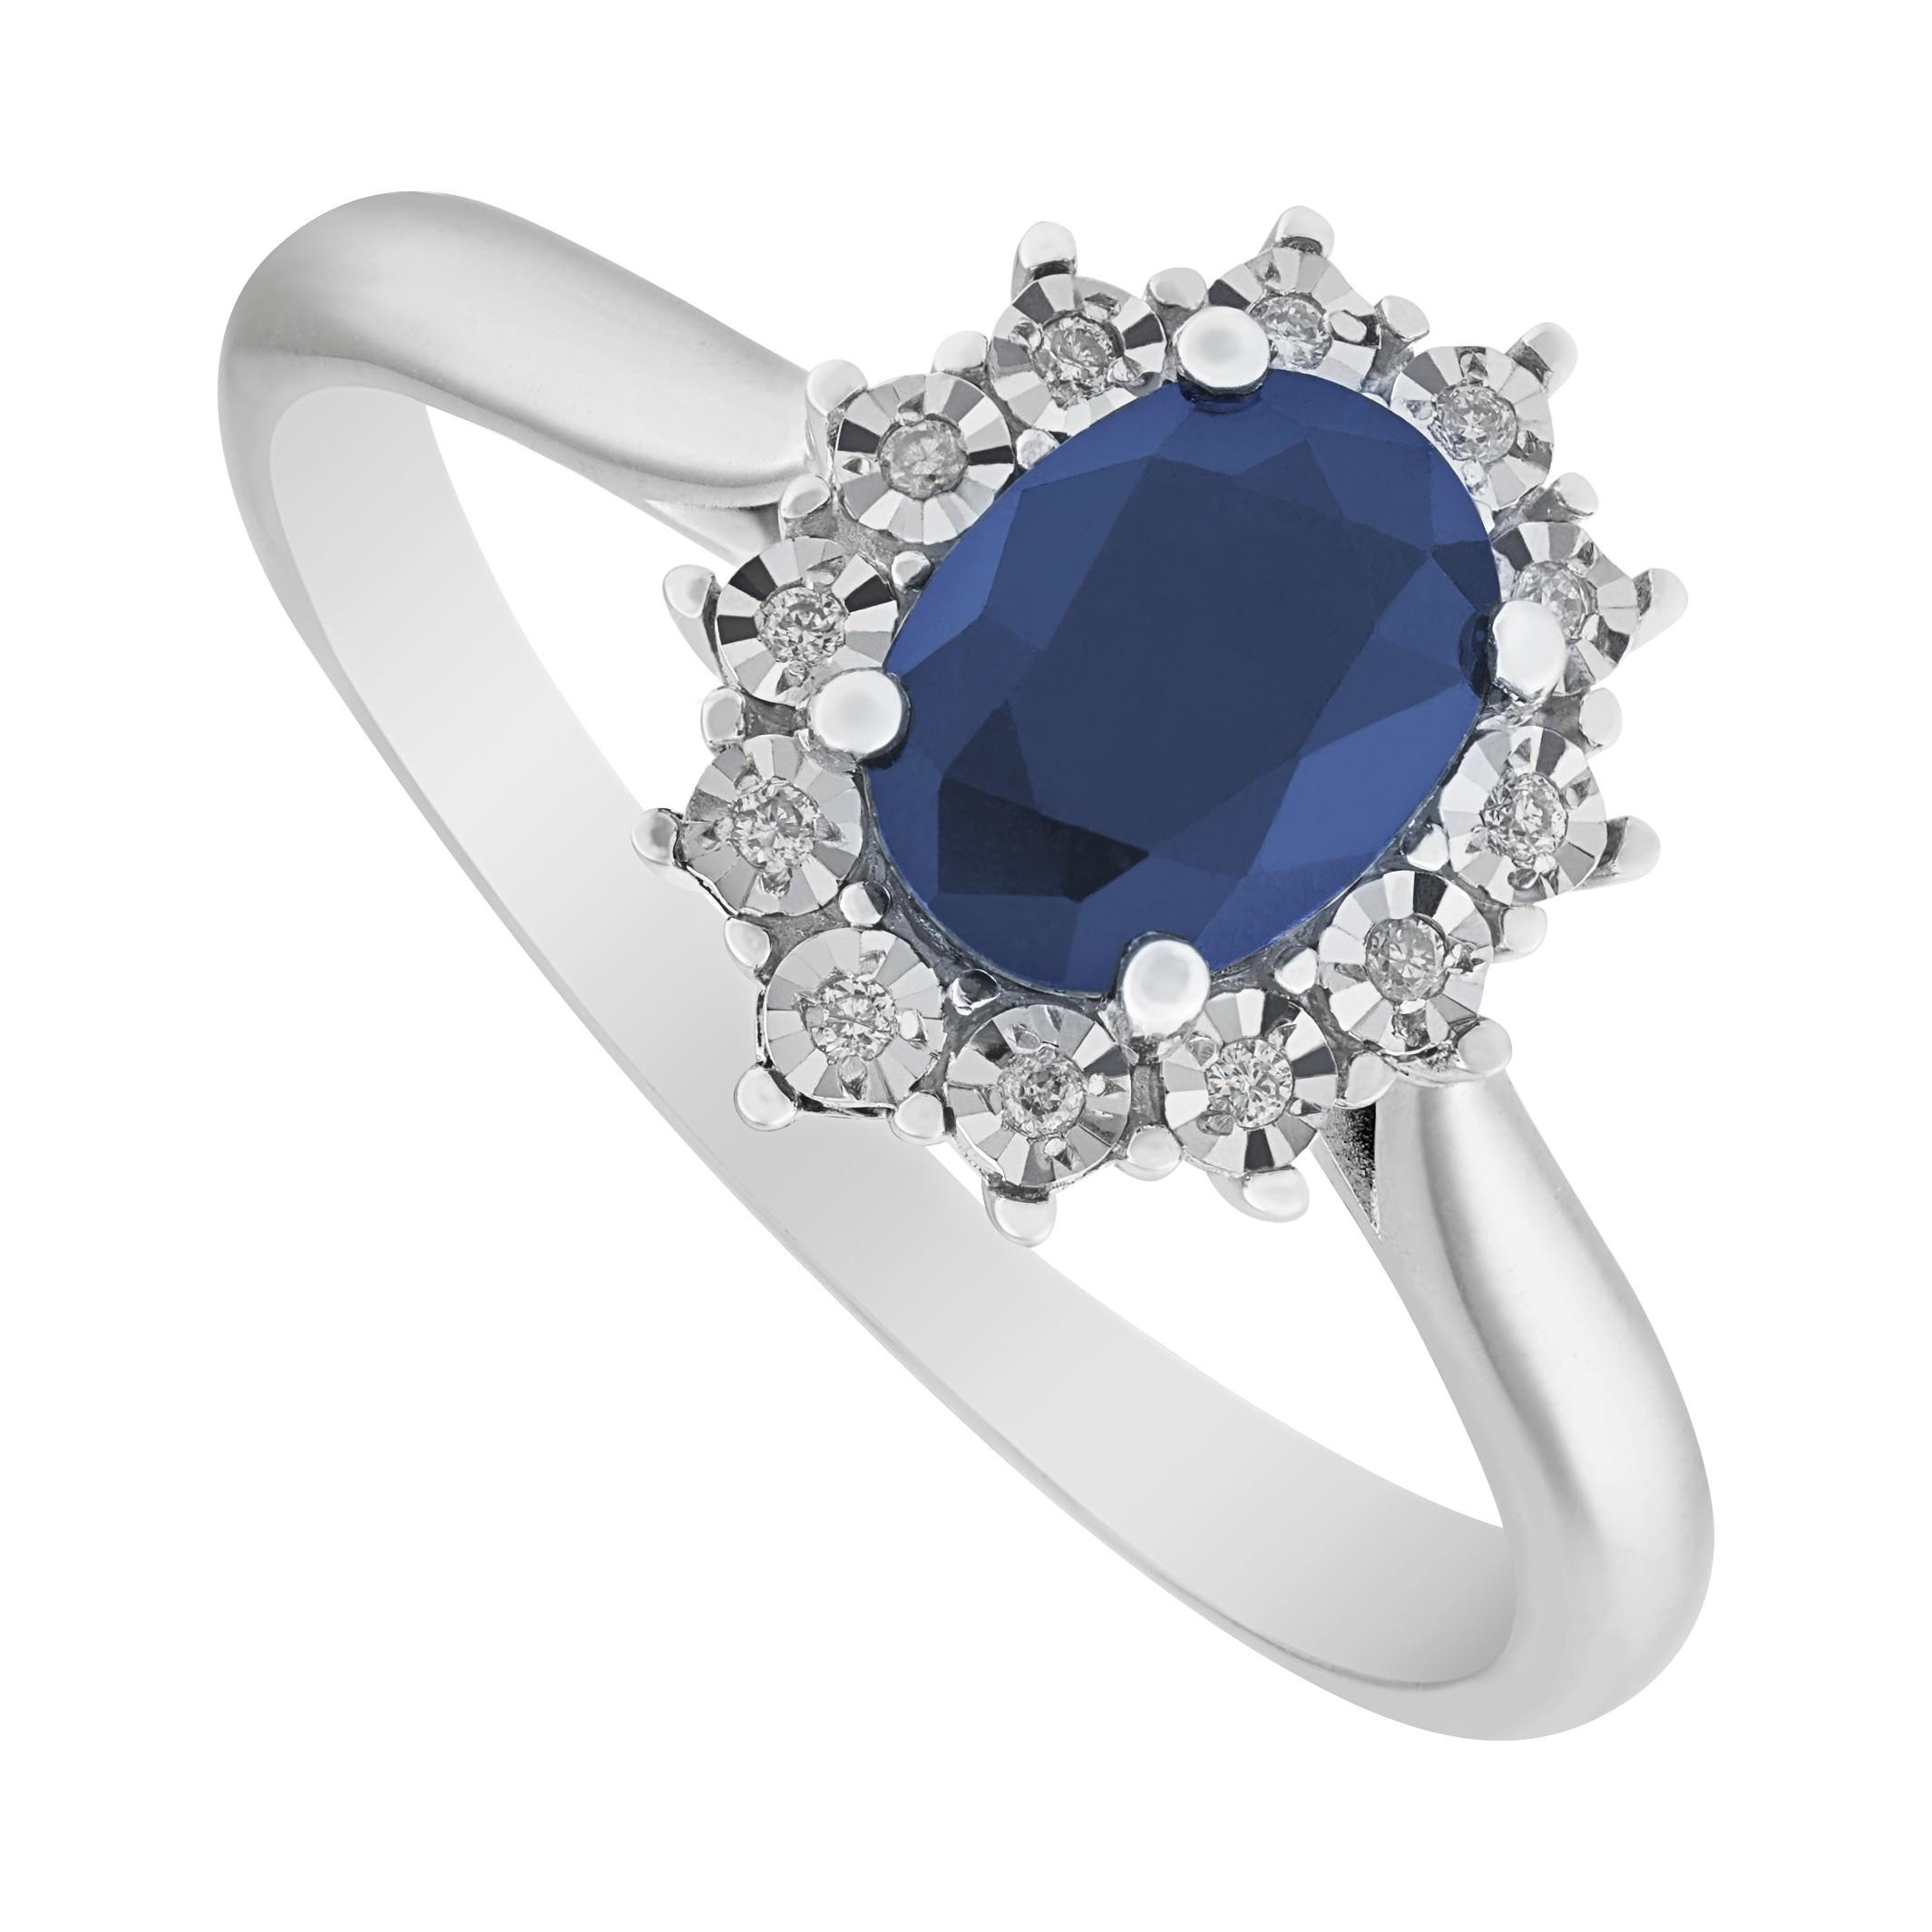 Sapphire And Diamond Ring Designs